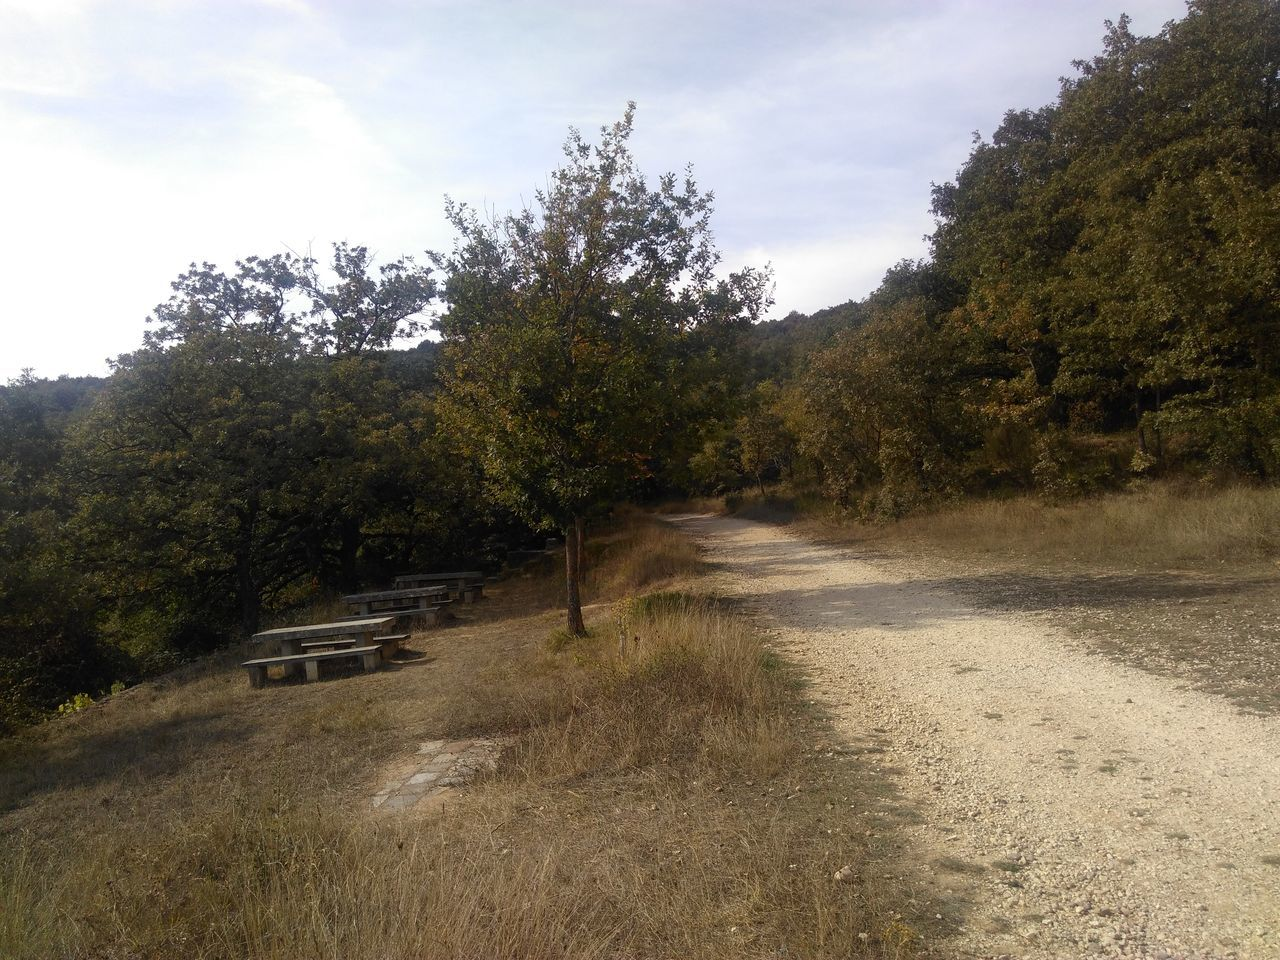 No People Jakobsweg Way Of Saint James Camino CaminodeSantiago Camino De Santiago Road Track Way Reise Travel